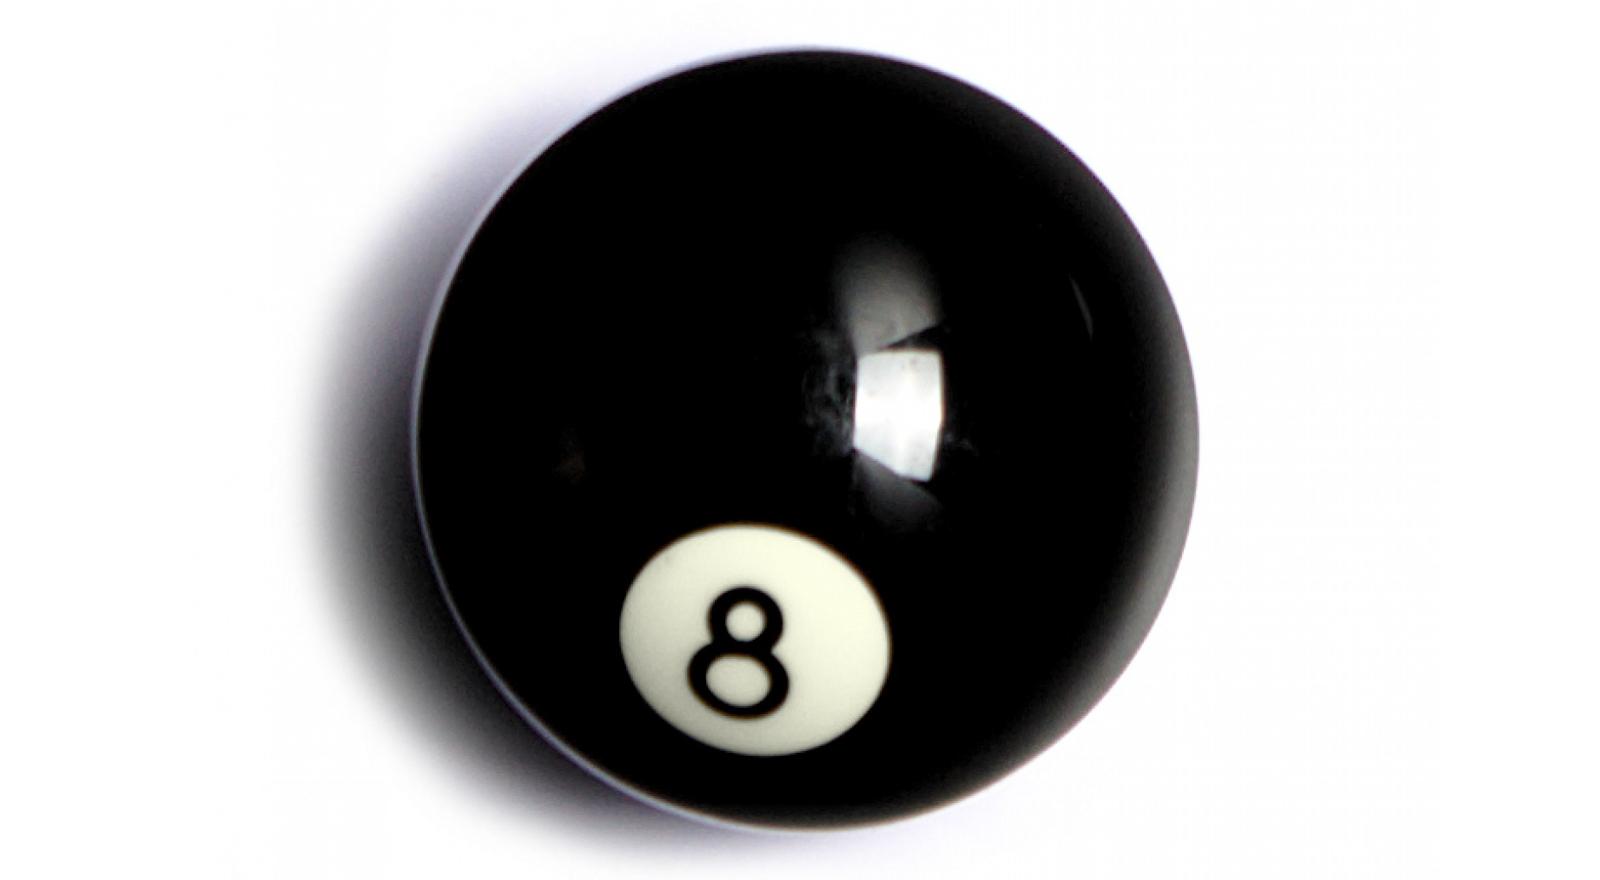 REPLACEMENT PREMIUM BILLIARD POOL BALLS 1 3 4 6 8